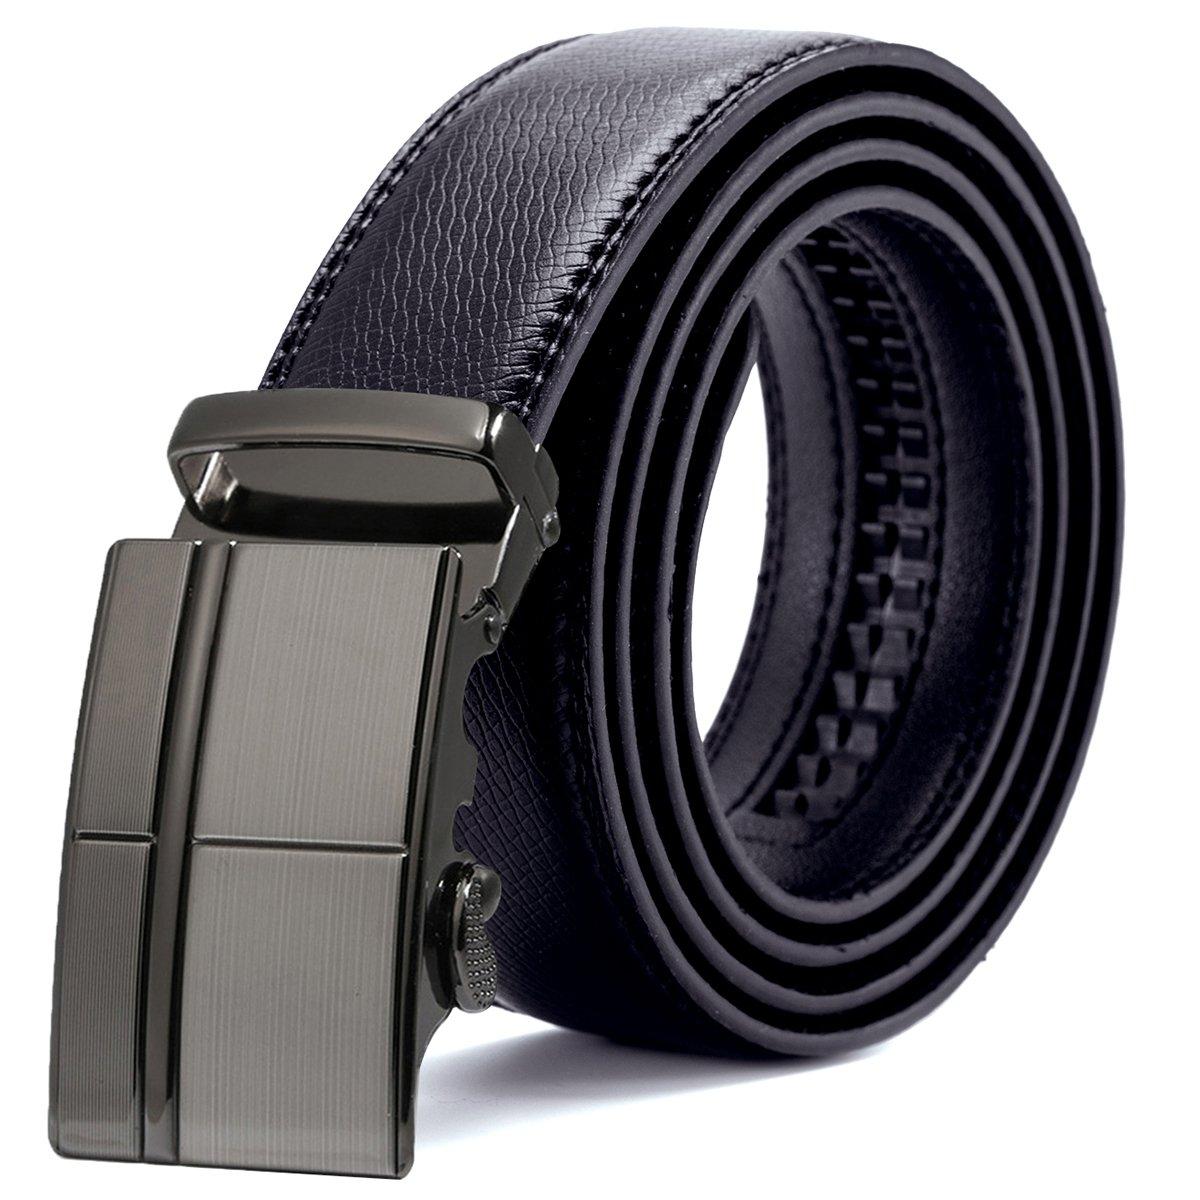 ITIEZY Ratchet Dress Belt For Men Click Belt Wide 1 3/8' with Automatic Buckle